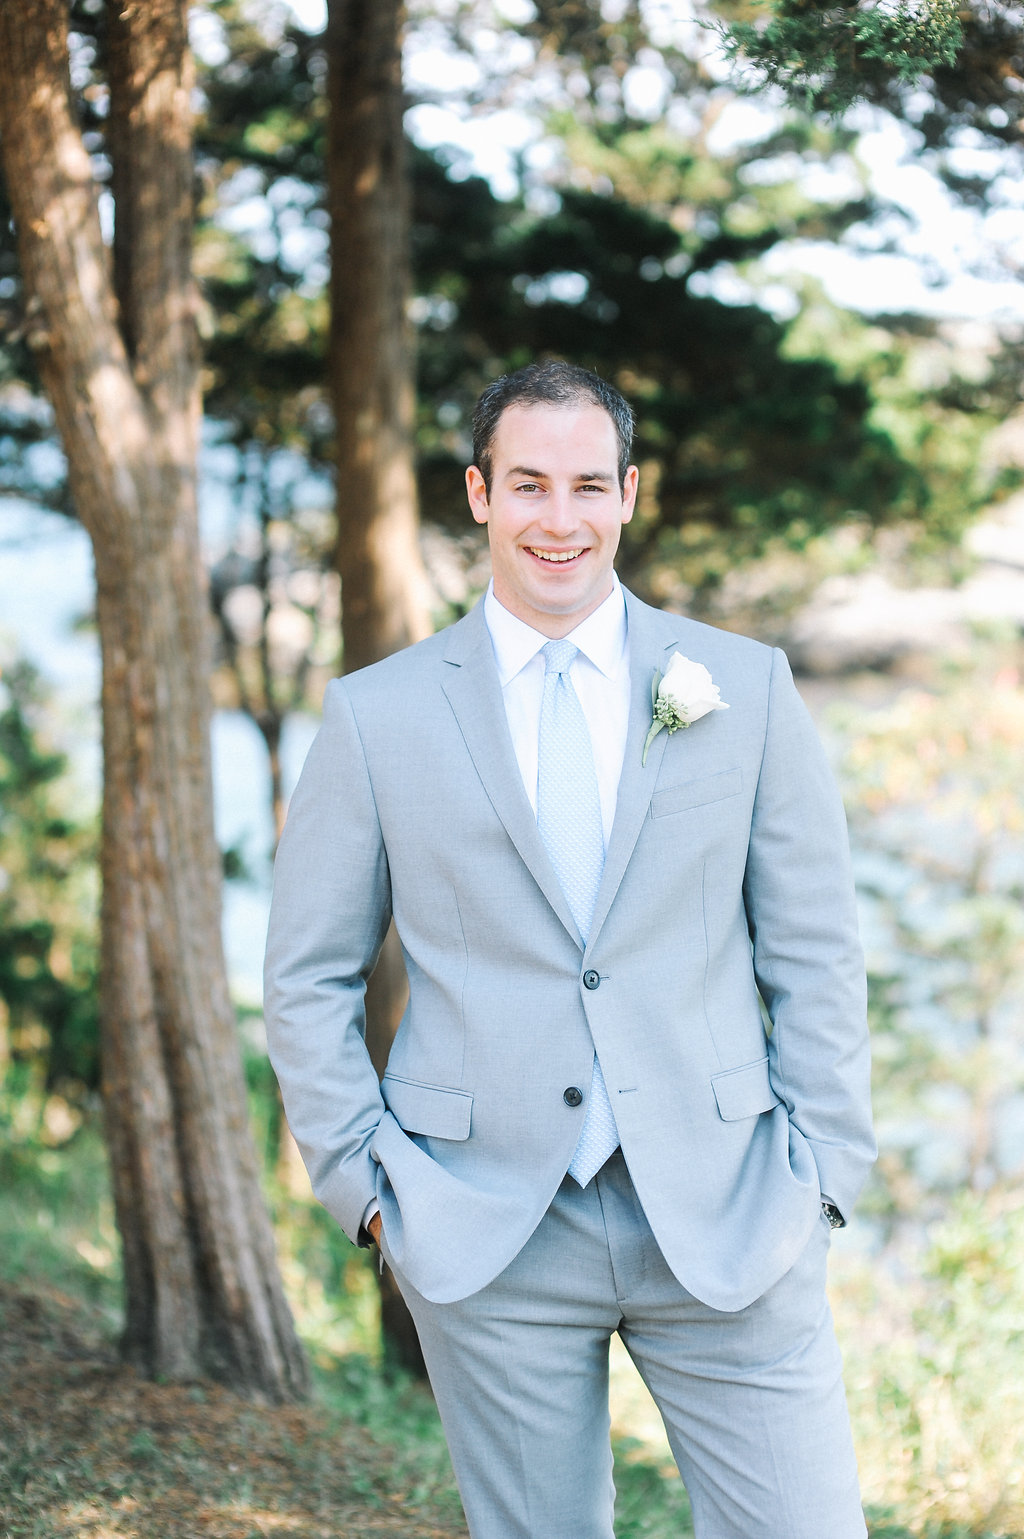 BrideGroomPortraits_Dragonline_Studios_Jamestown_RI_Wedding-62.jpg